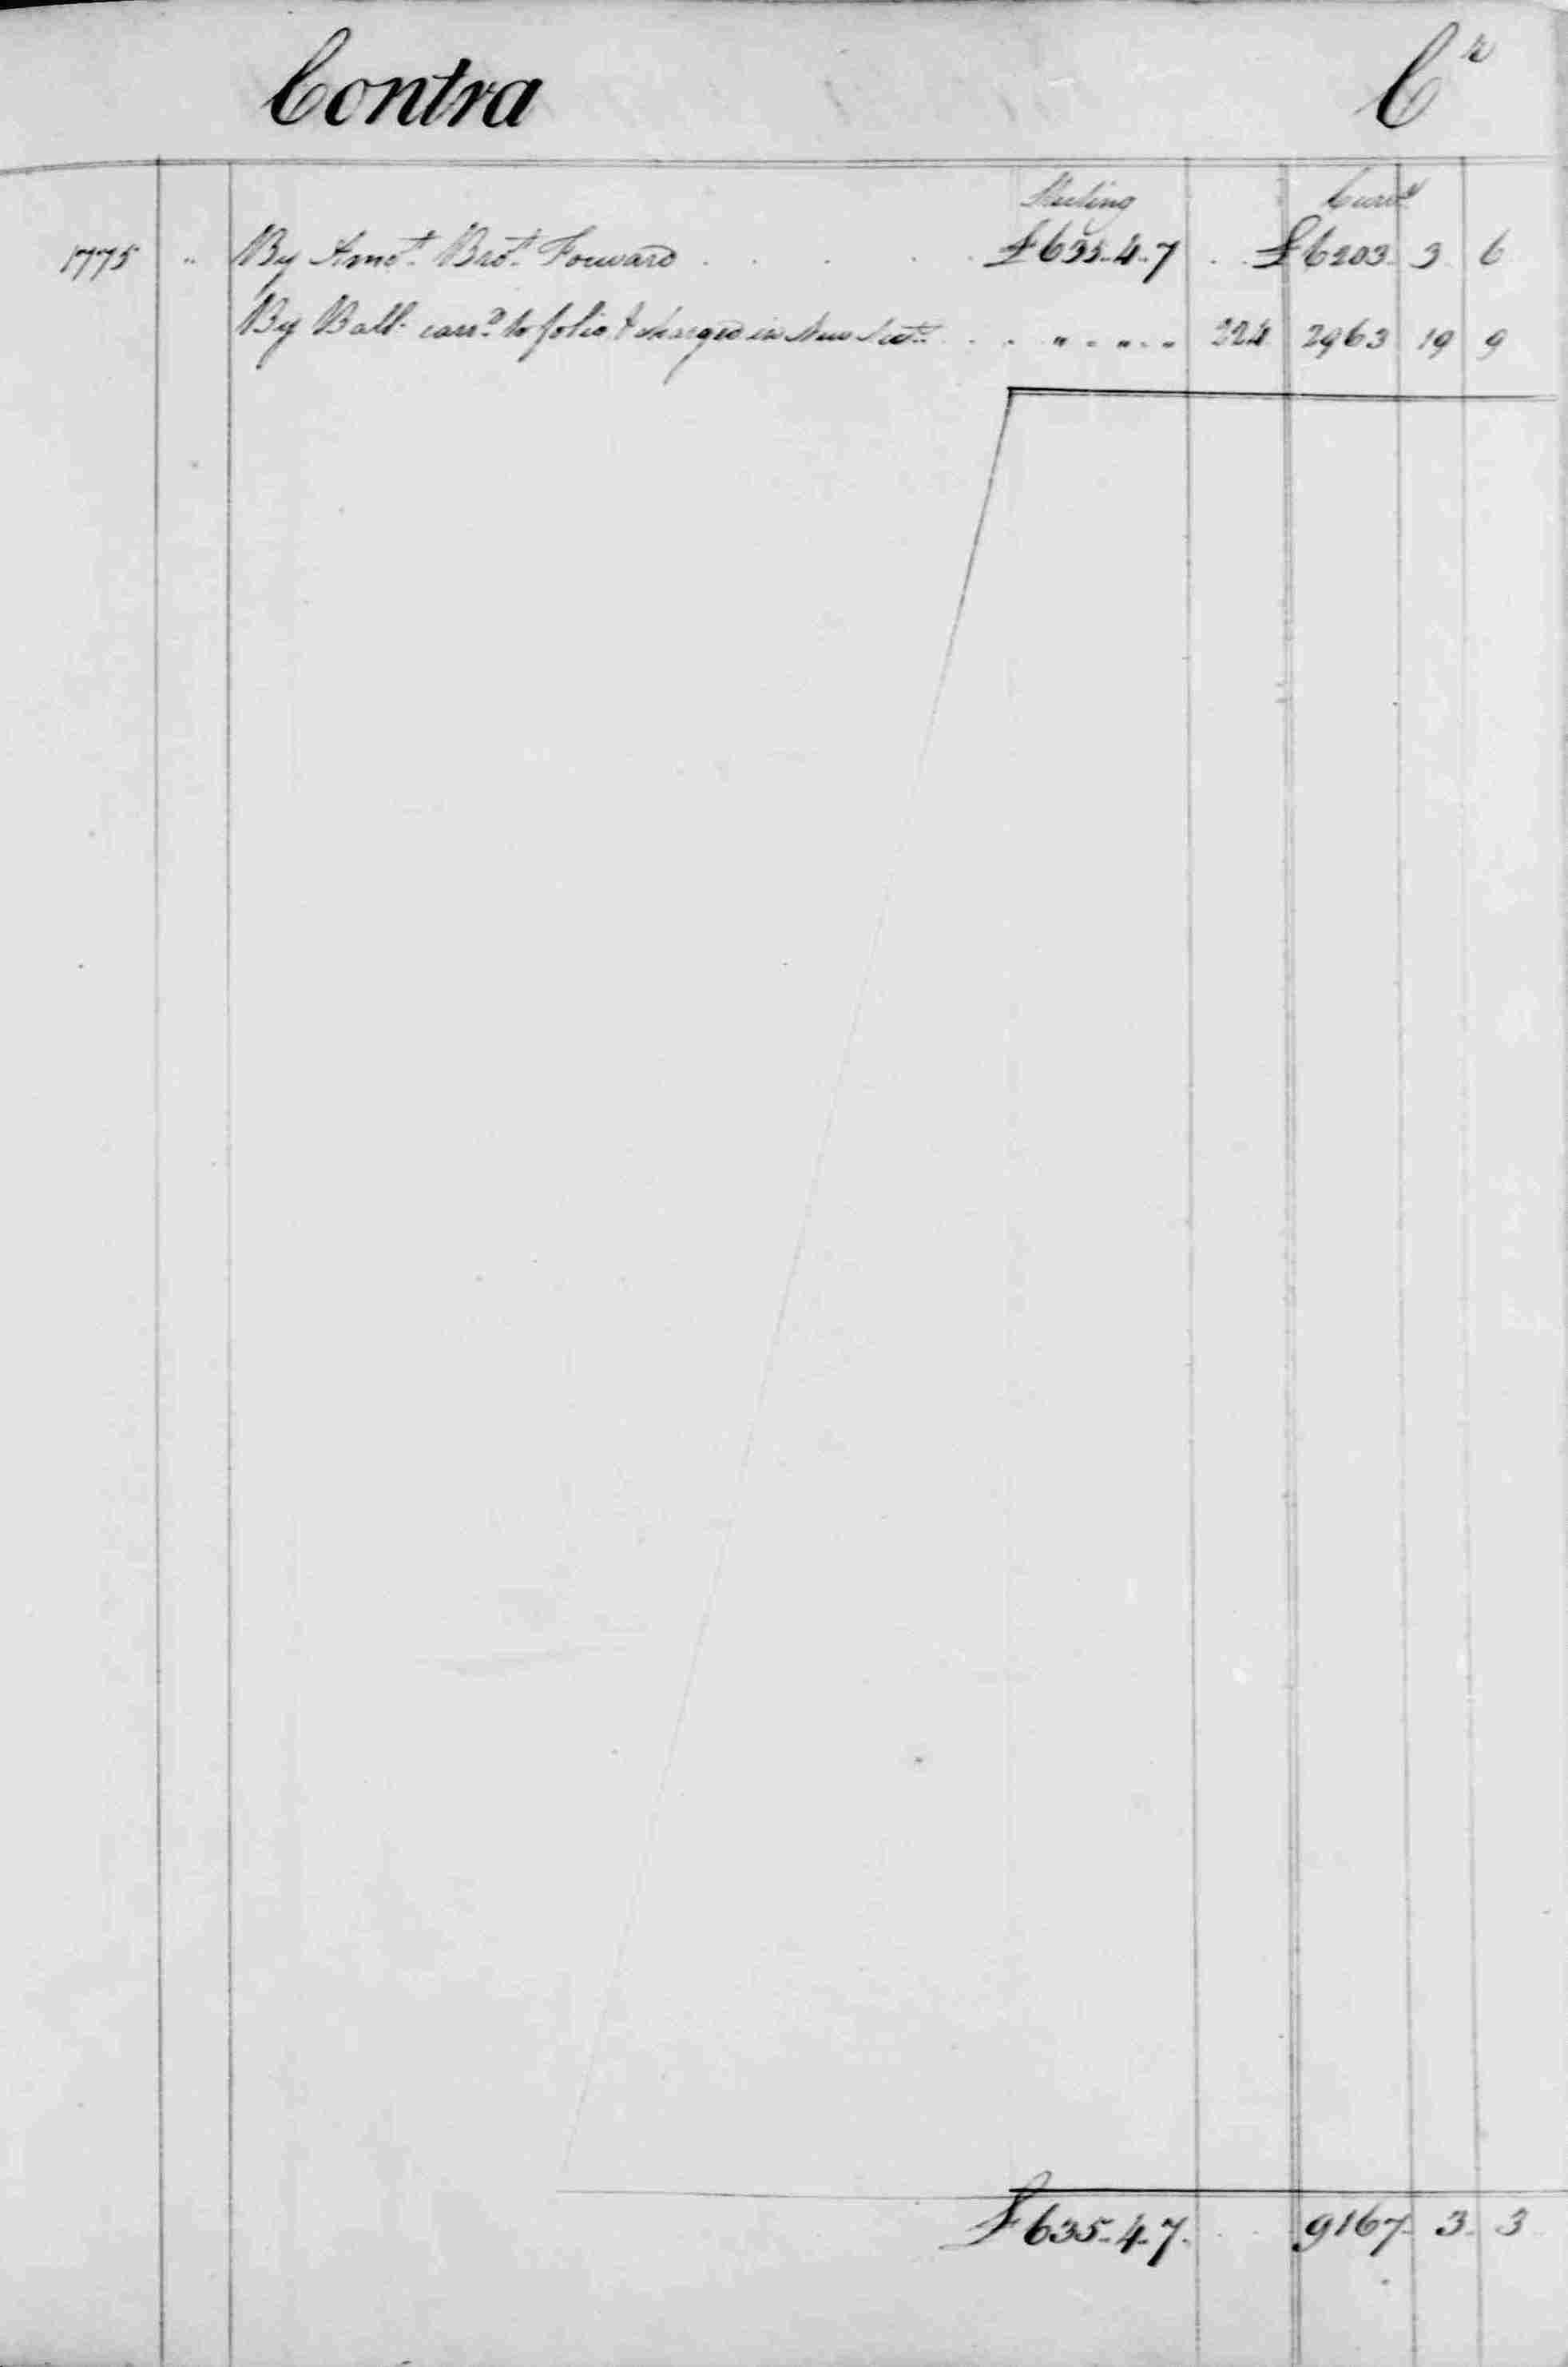 Ledger B, folio 219, right side